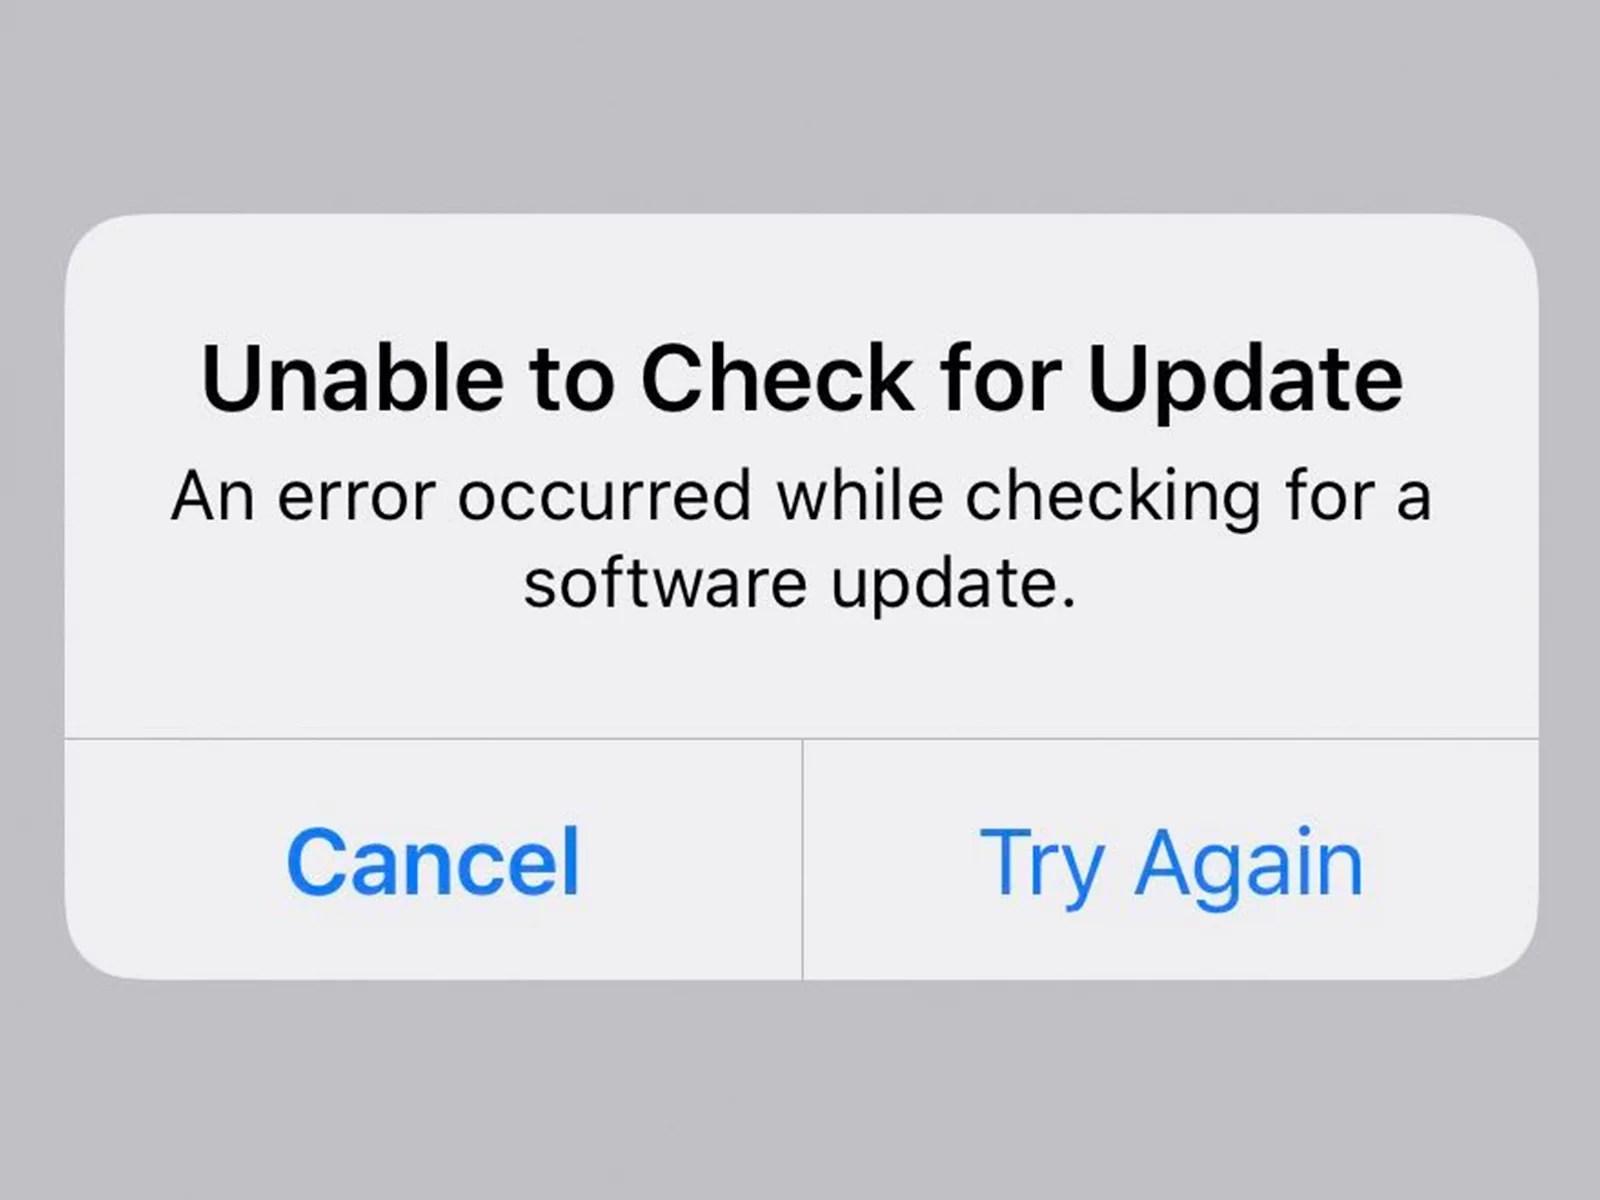 Error de actualizaci贸n de iPad